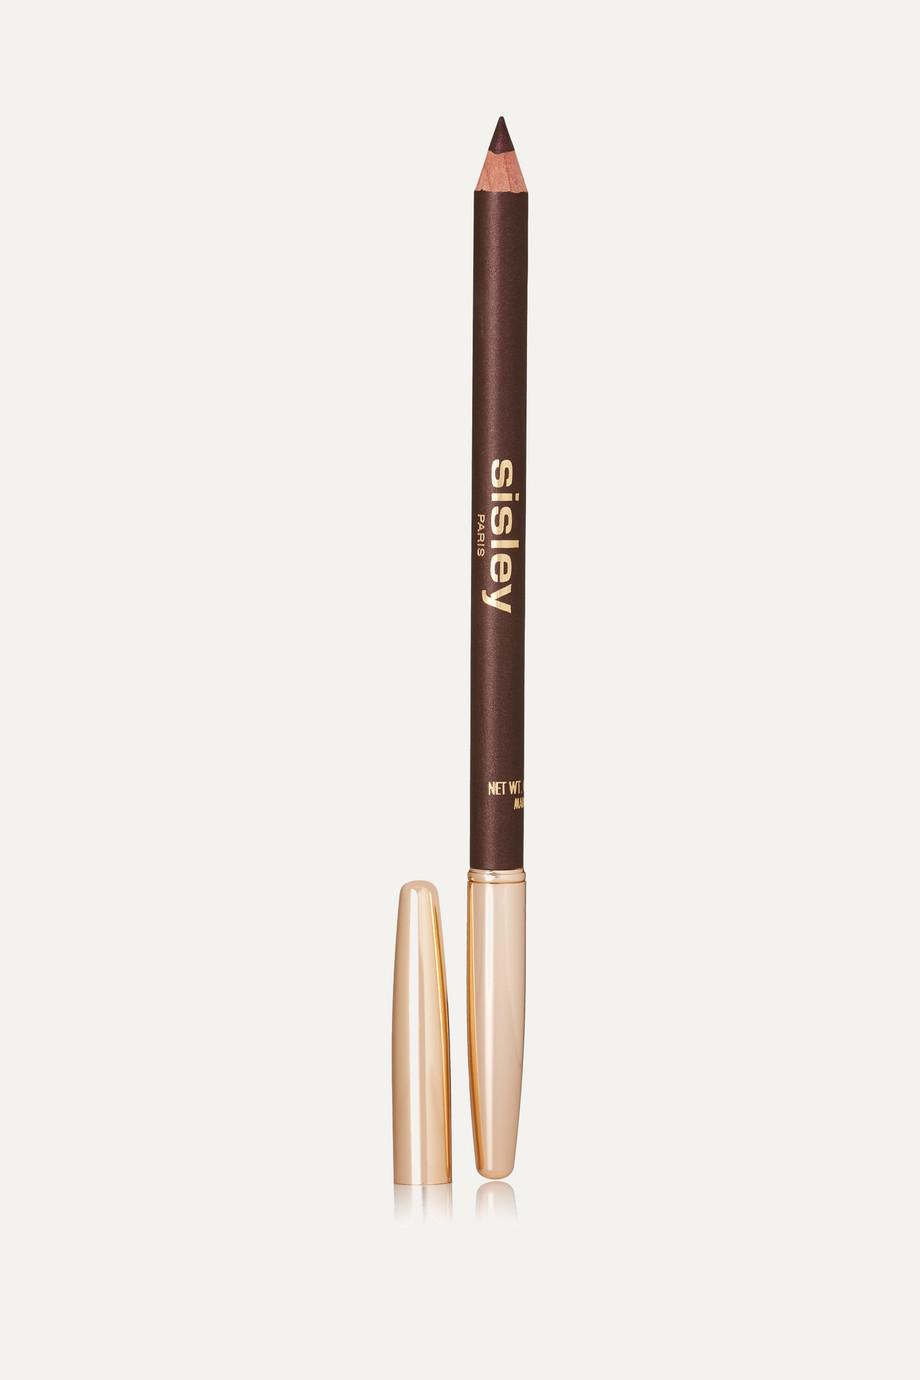 Sisley Phyto-Kohl Perfect Eyeliner – 2 Brown – Kajal